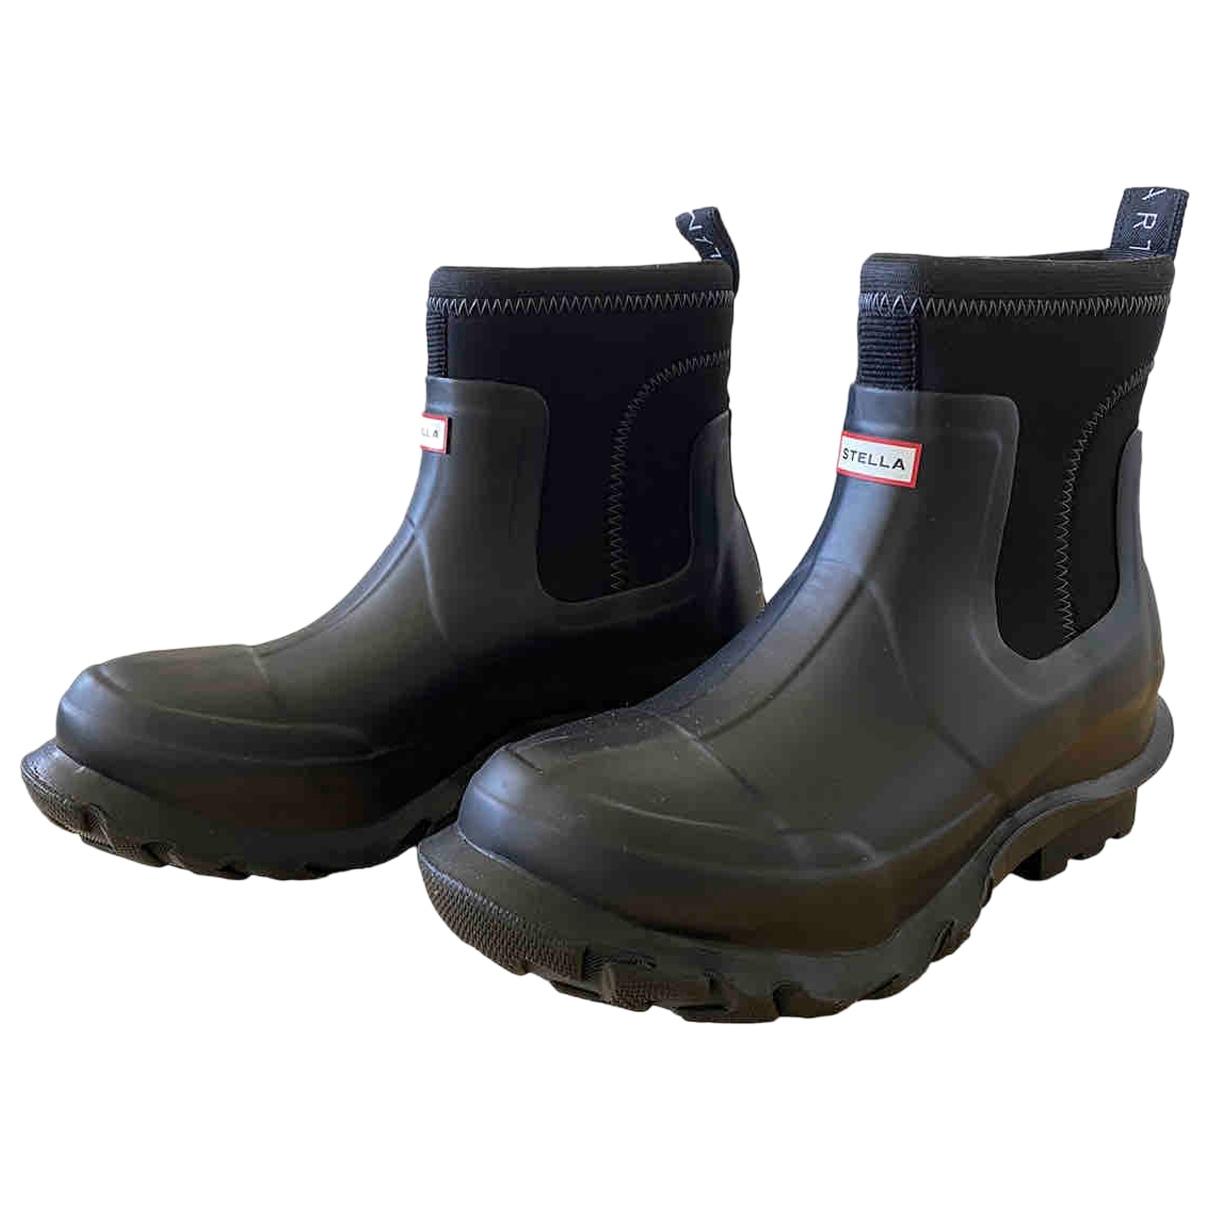 Stella Mccartney N Black Rubber Boots for Women 8 UK